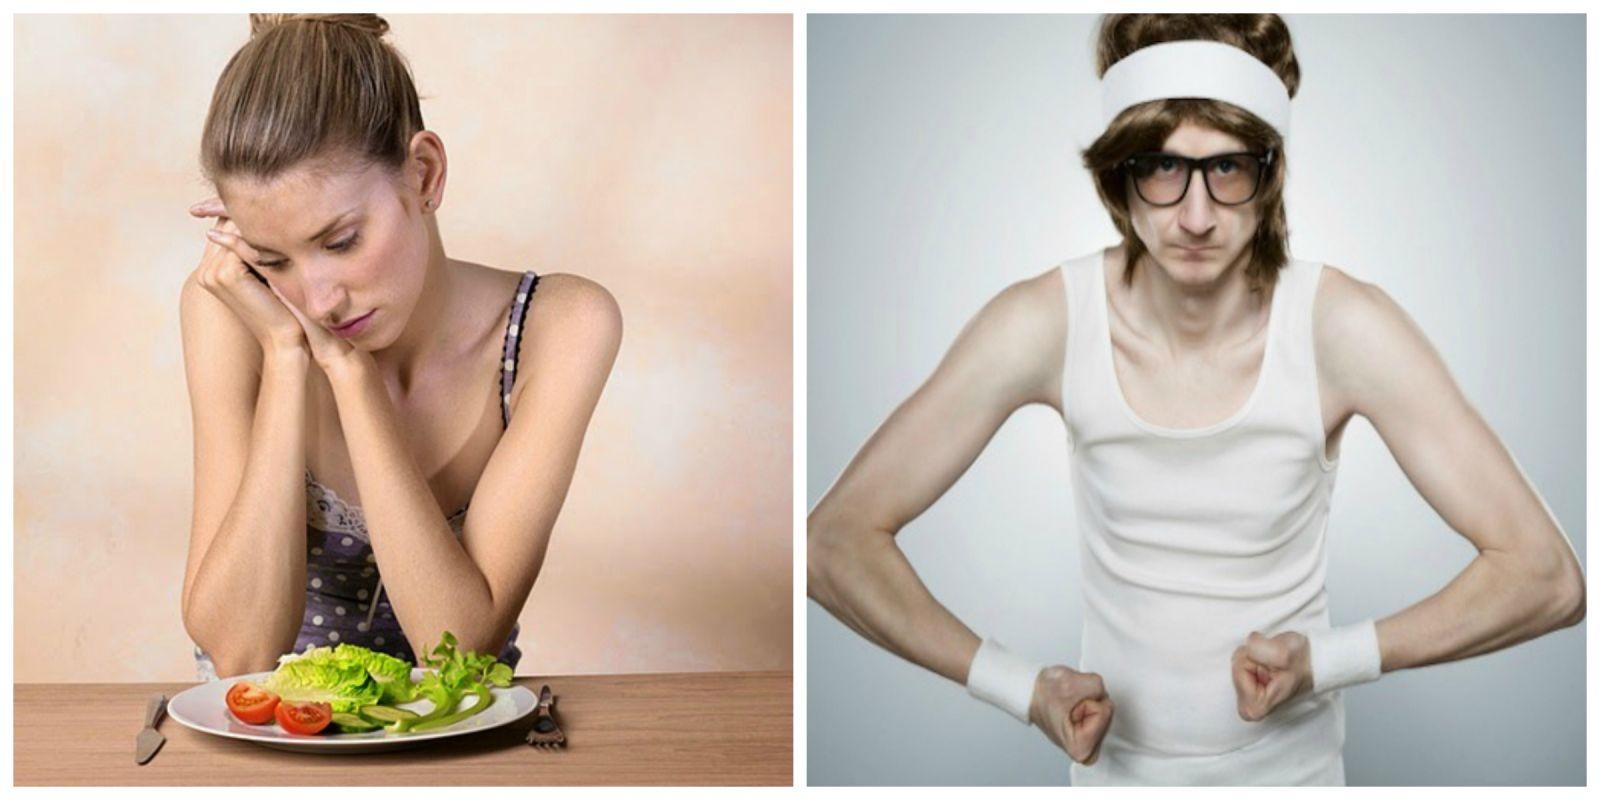 Ăn gì nhanh tăng cân